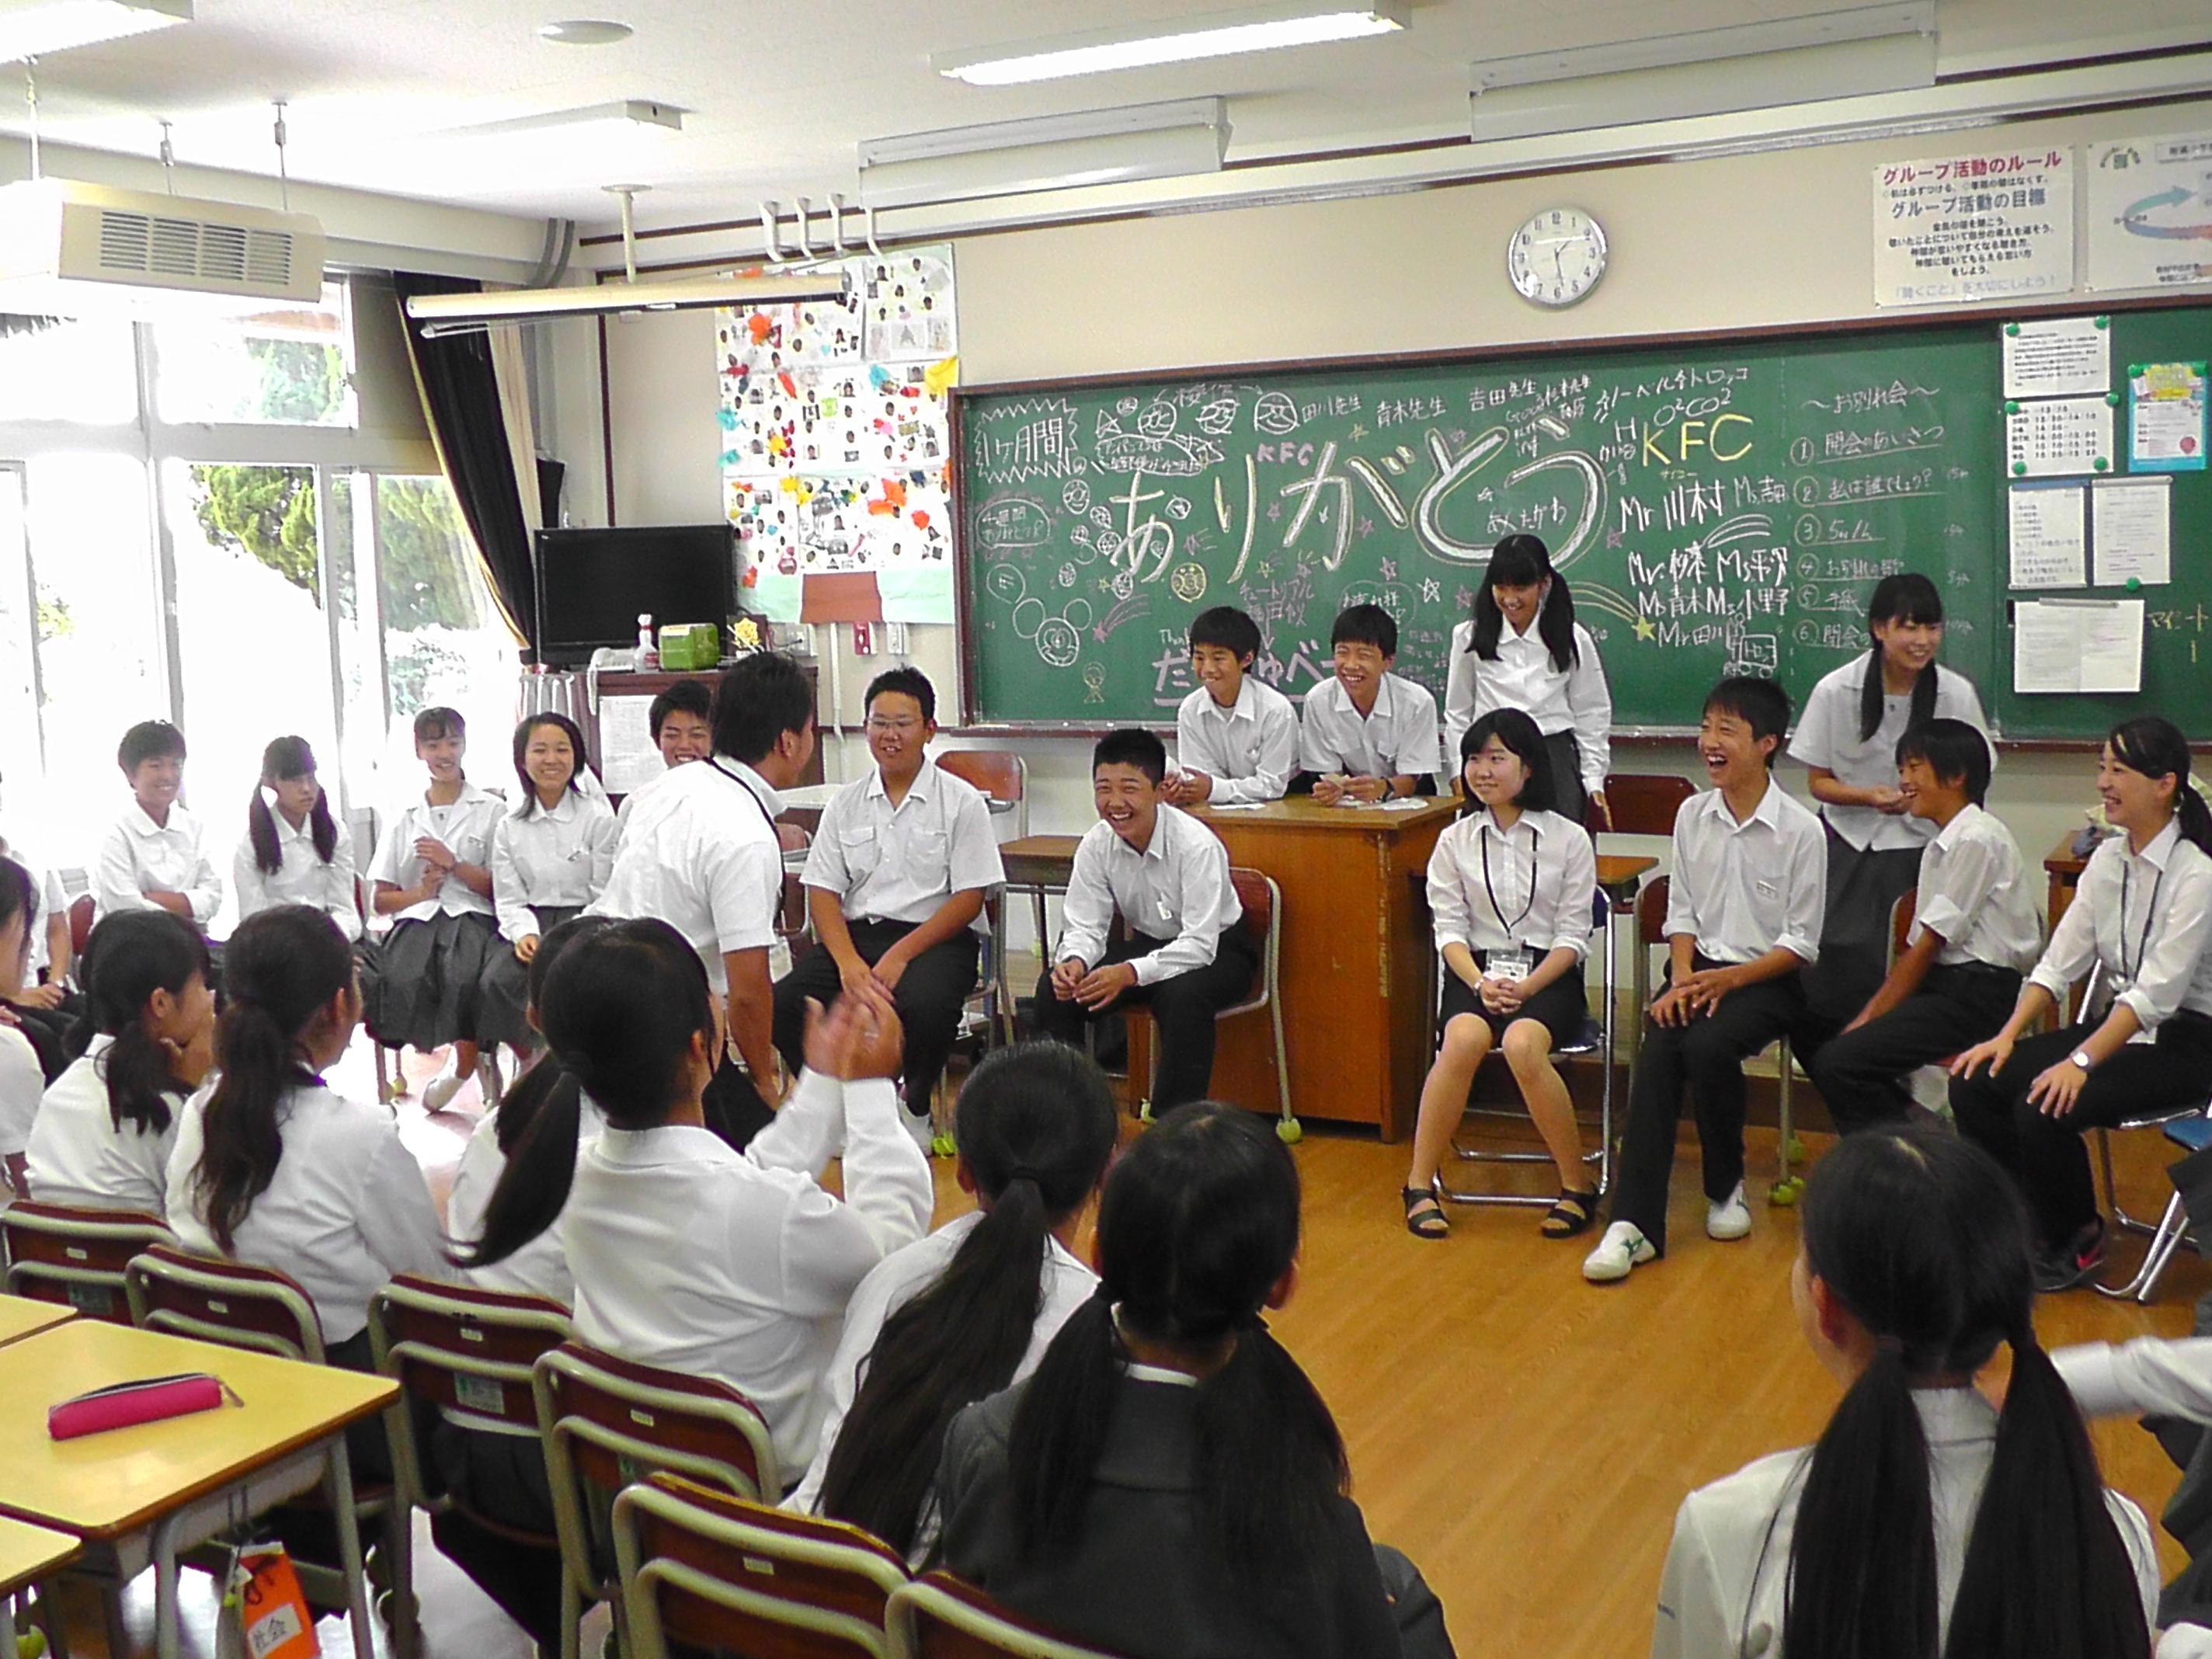 http://www.fuzoku.edu.mie-u.ac.jp/chu/%E3%81%BB%EF%BC%97.JPG